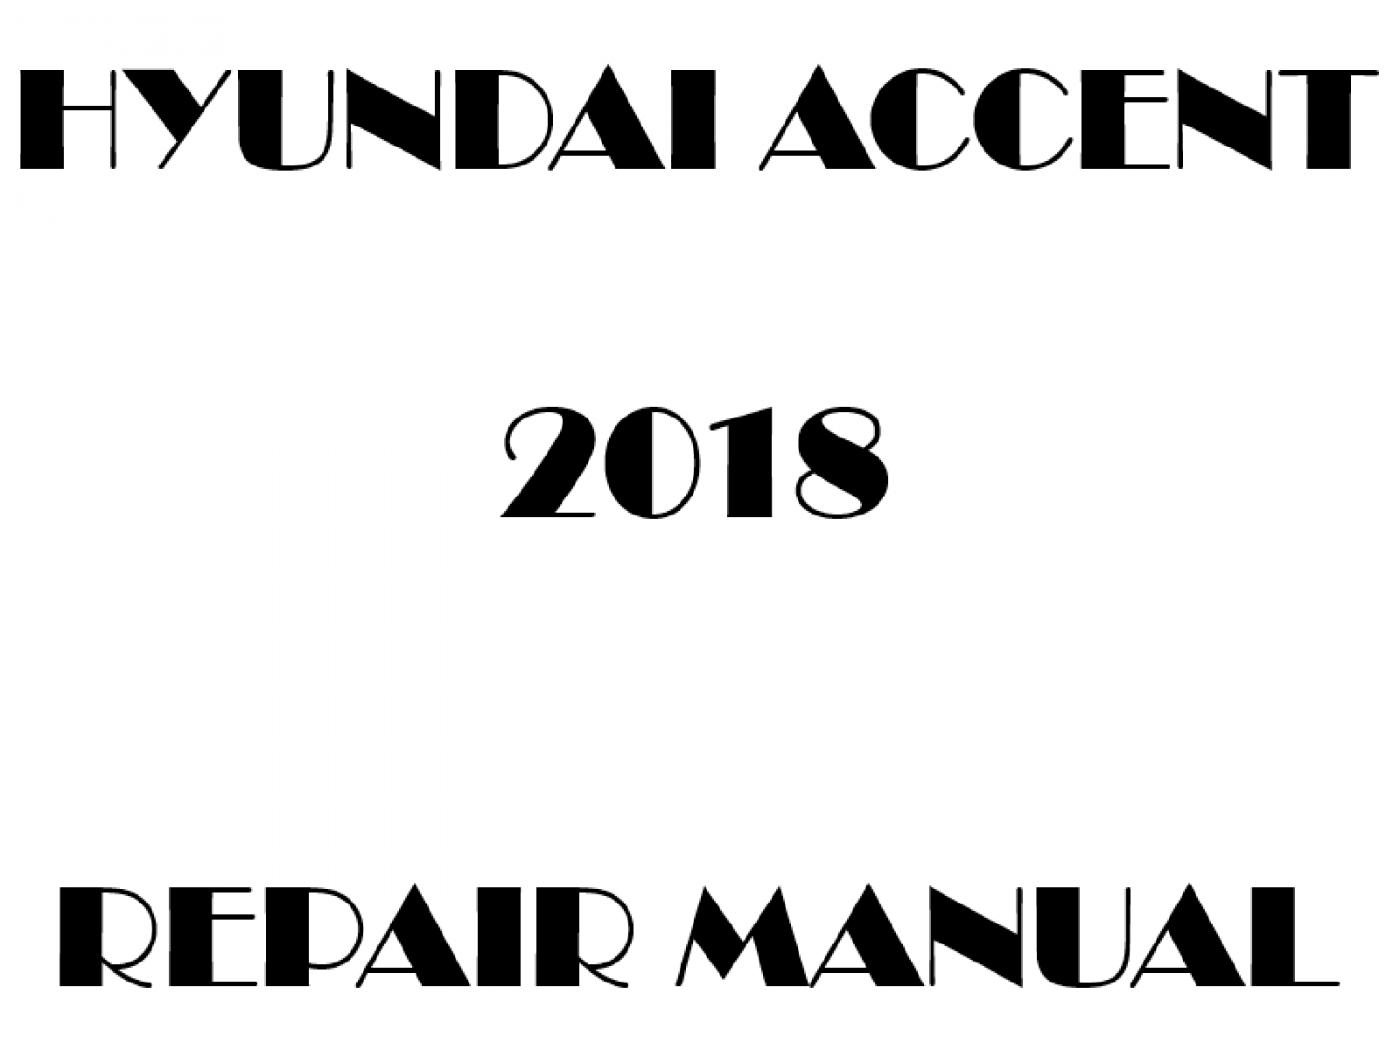 2018 Hyundai Accent repair manual